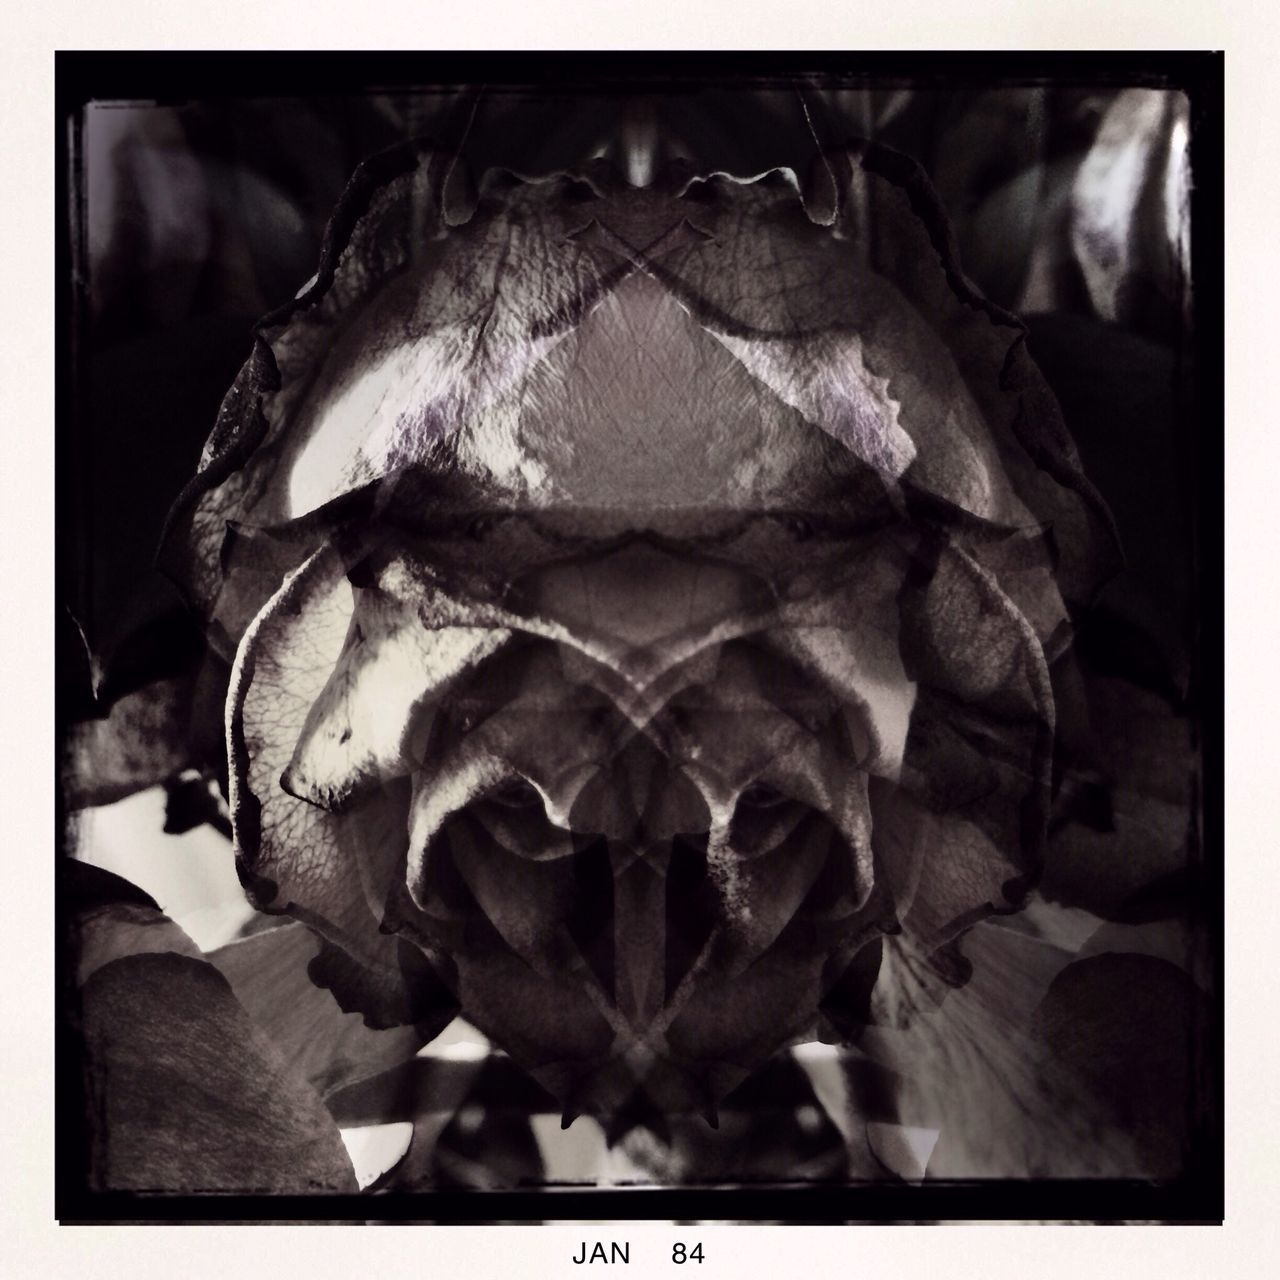 animal skull, close-up, animal themes, no people, one animal, indoors, nature, day, mammal